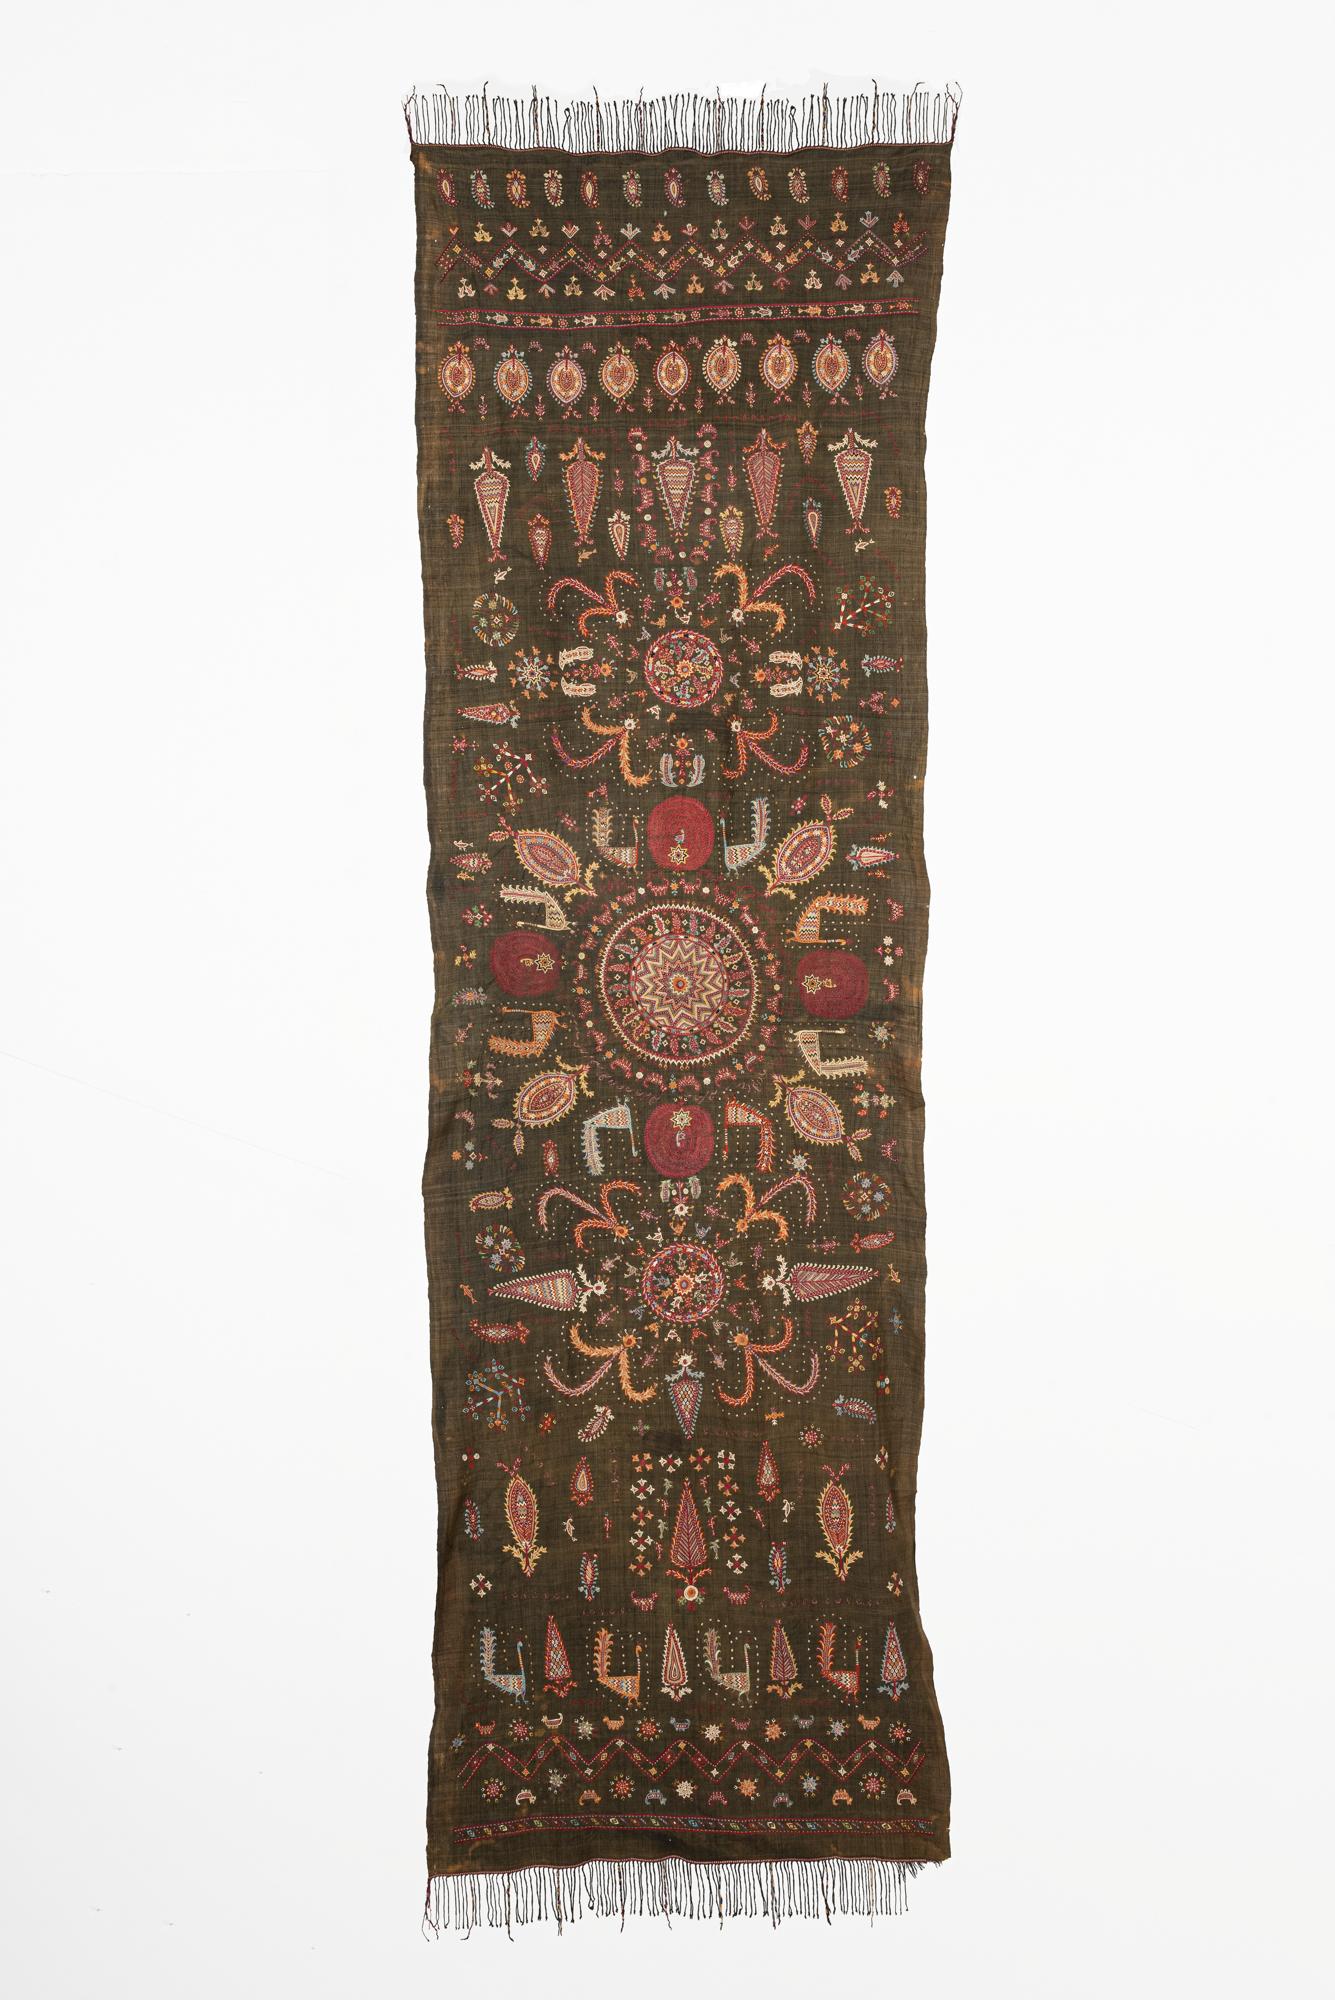 Embroidered silk wedding veil